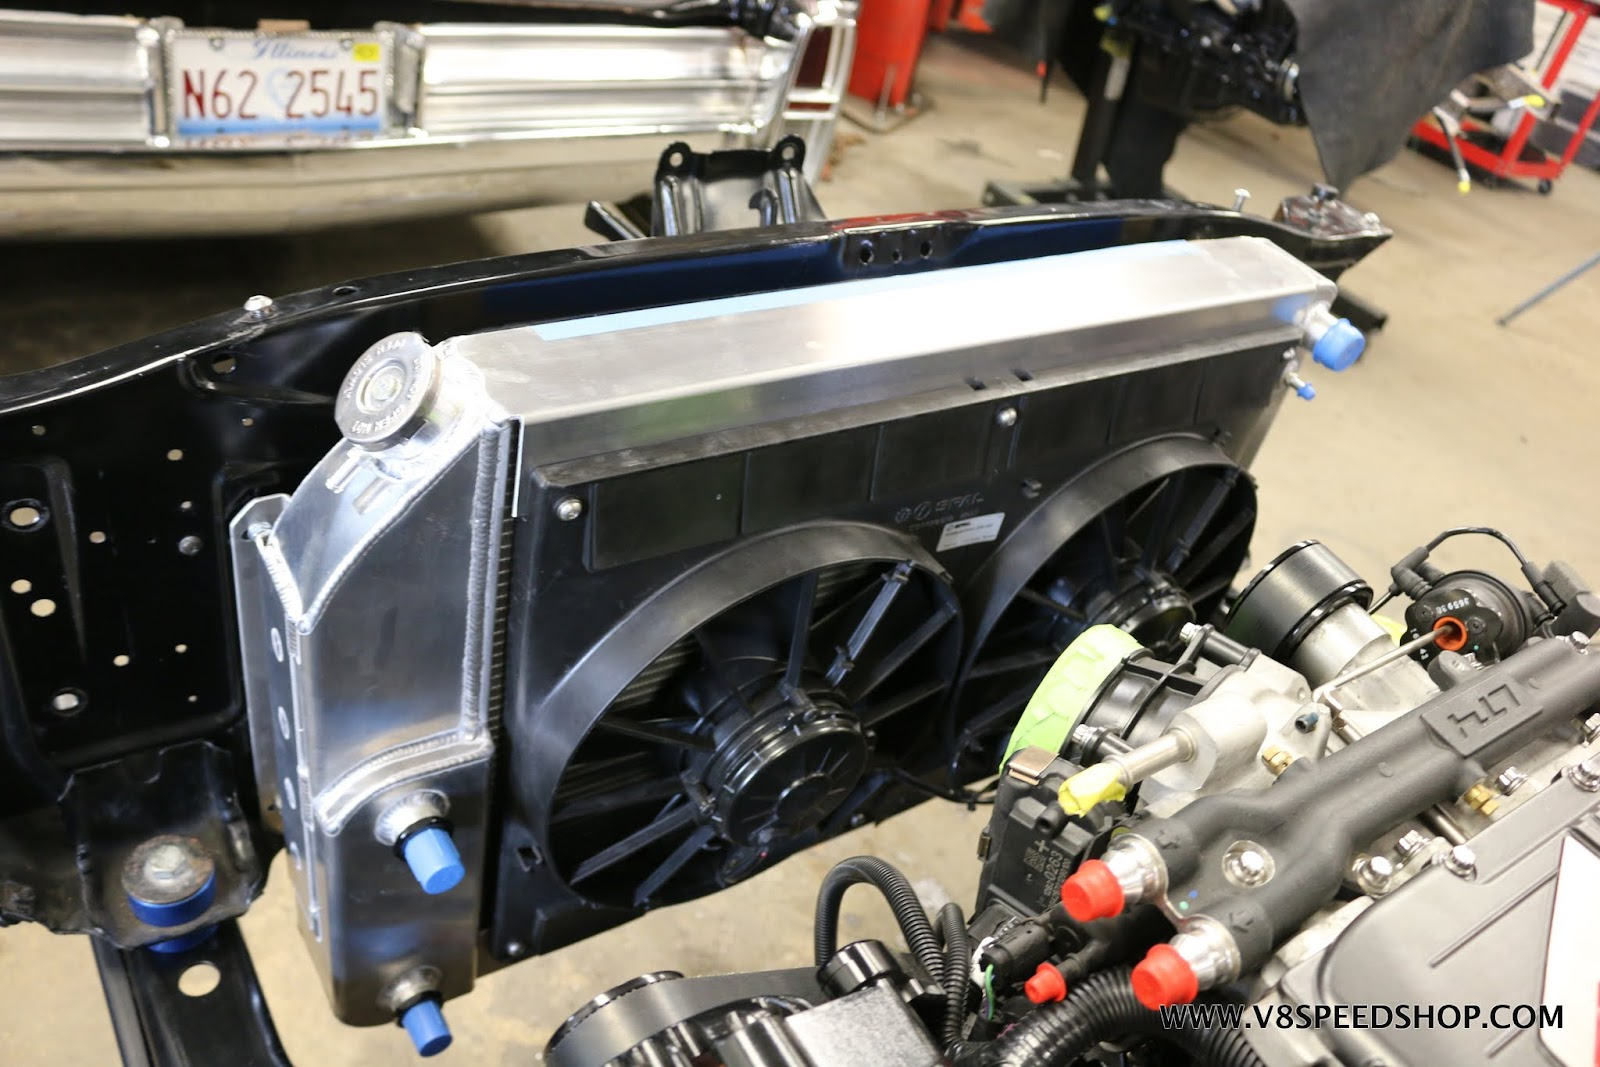 1969 Camaro Transforms From Big Block to Supercharged LT4 V8 at V8 Speed & Resto Shop